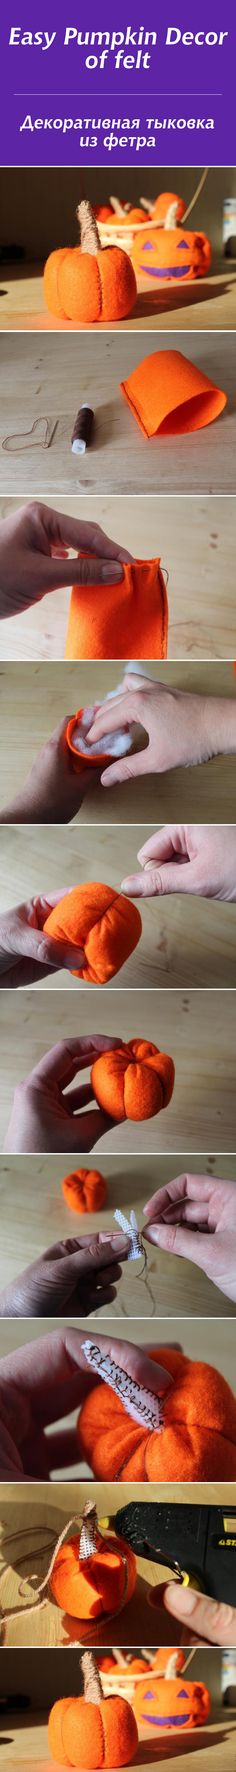 Never seen the stems done this way before Felt Crafts Patterns, Pumpkin Crafts, Pumpkin Decorating, Master Class, Stems, Felting, Diy Crafts, Seasons, Autumn